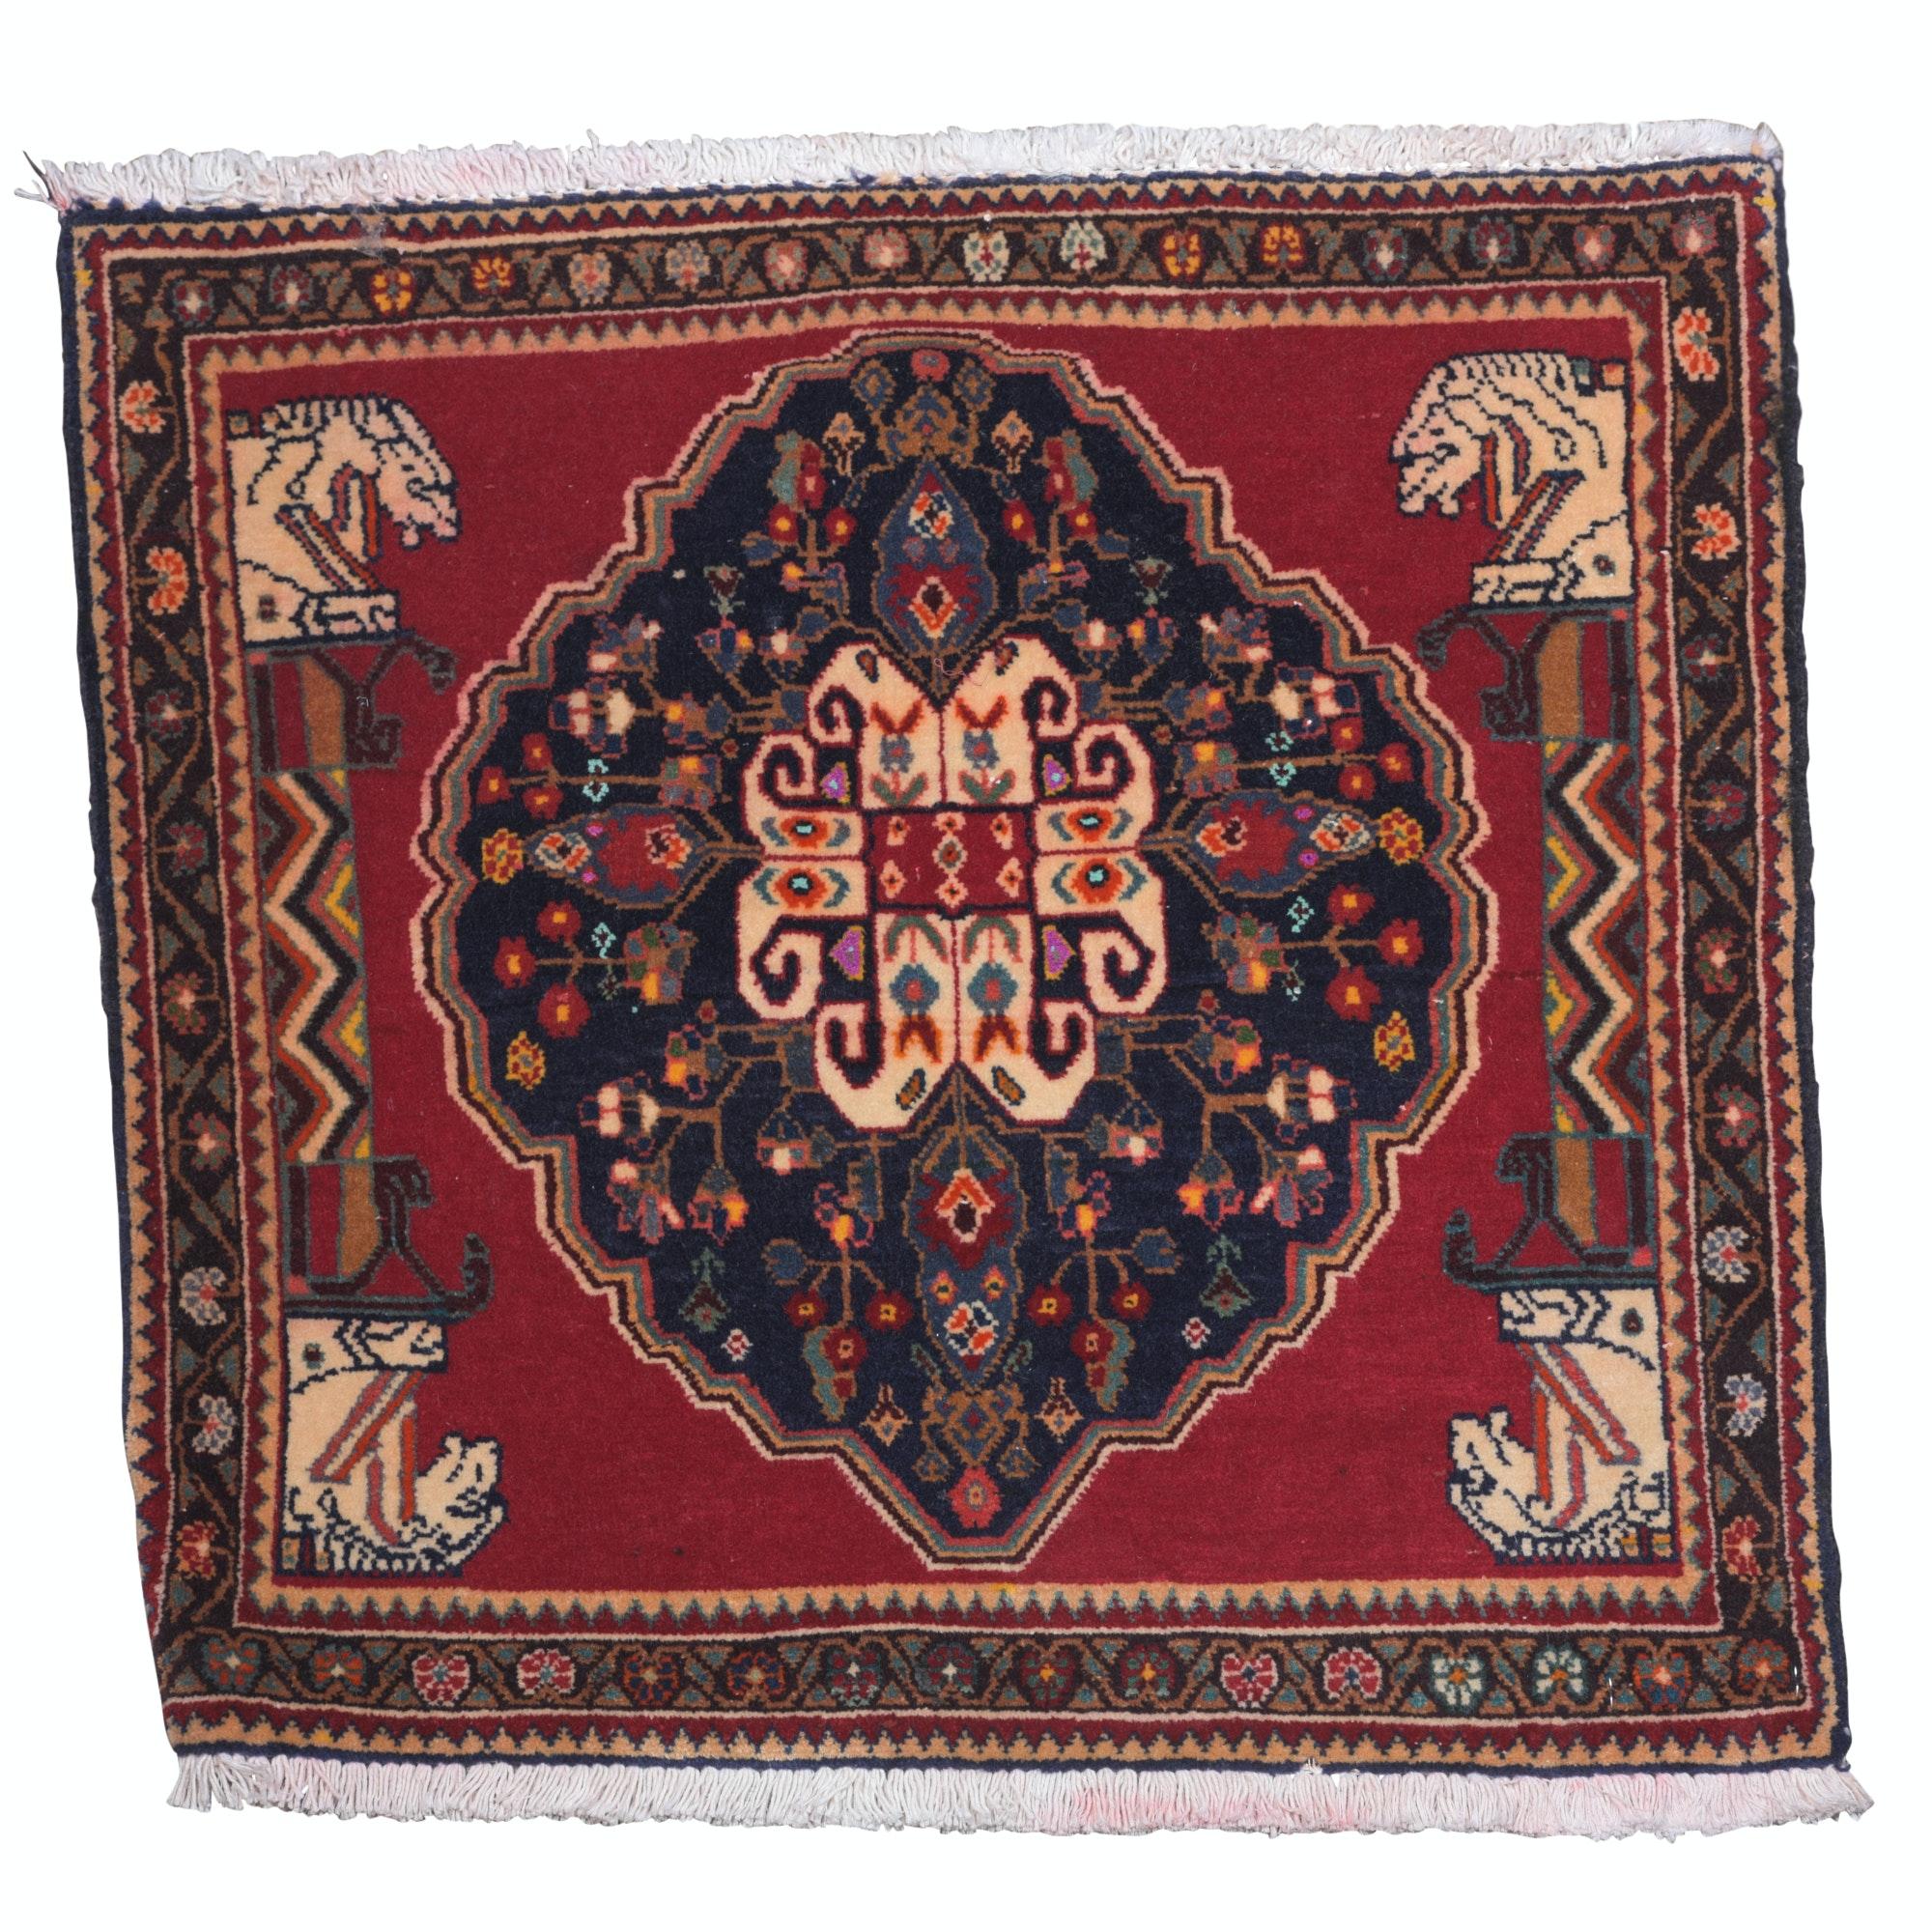 Hand-Knotted Persian Qashqai Wool Mat, possibly a Vagireh